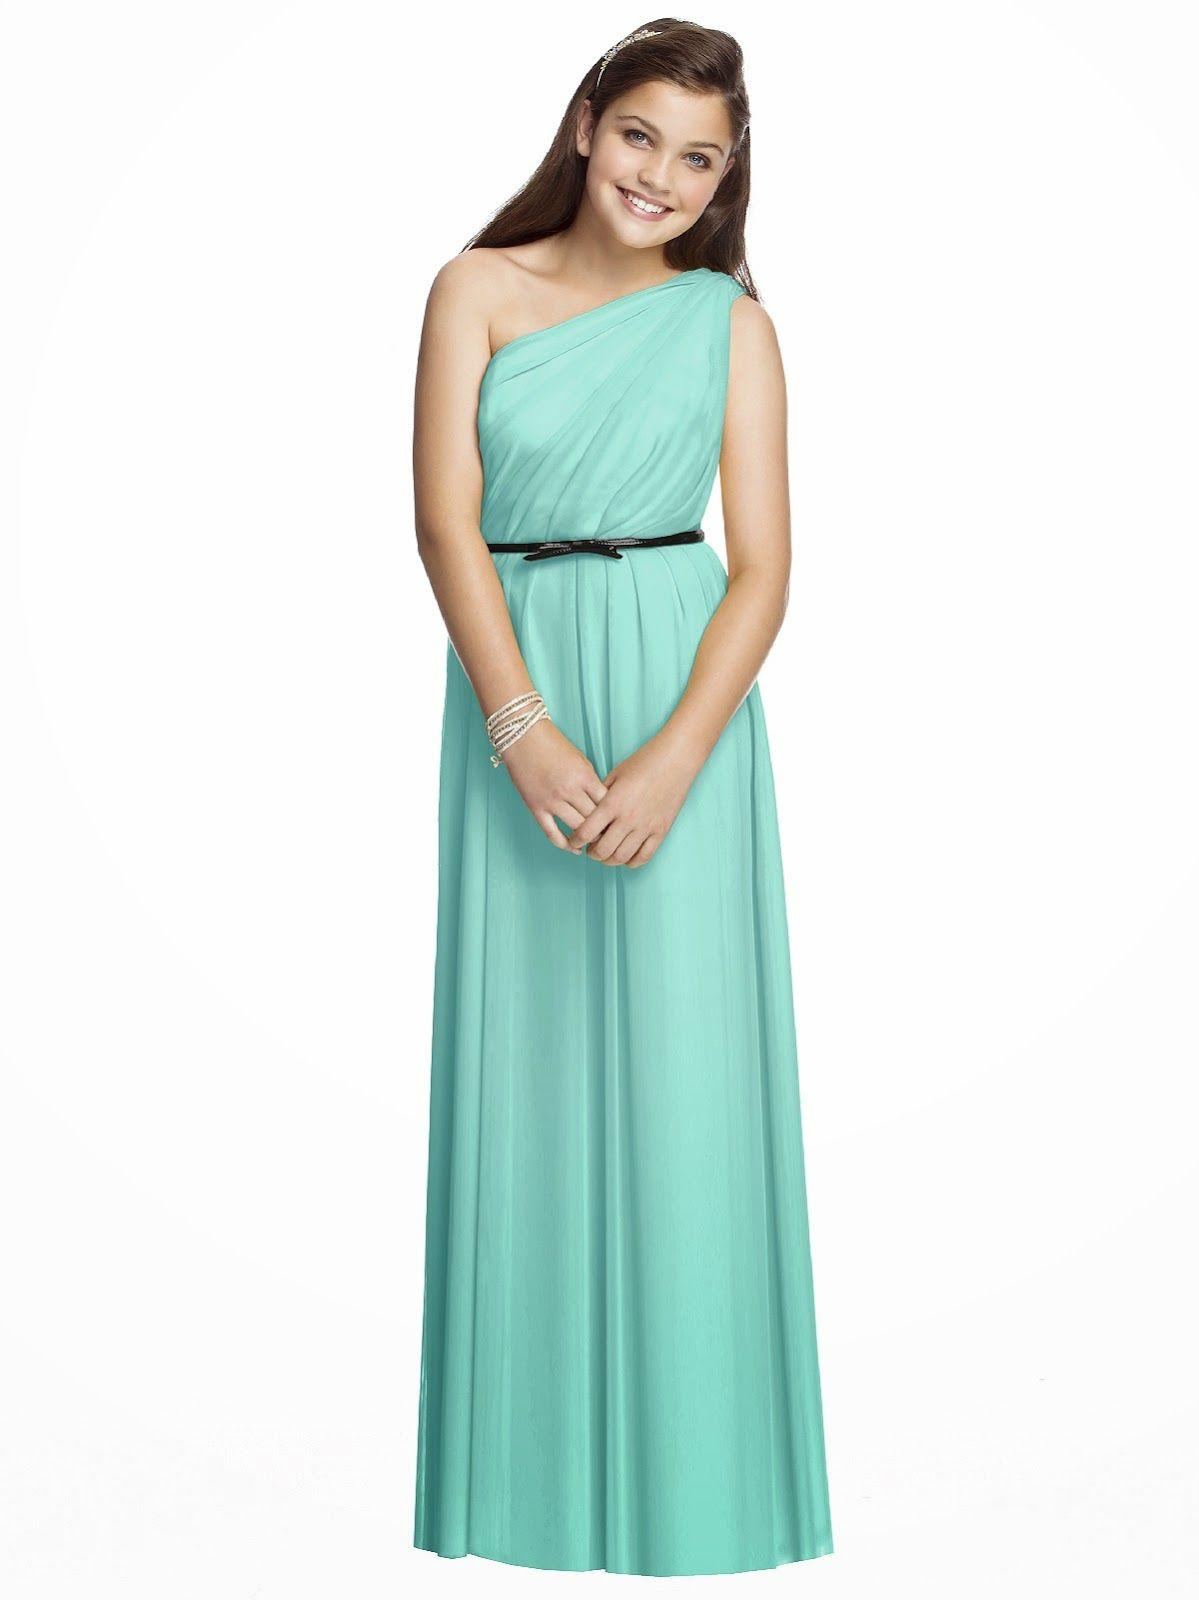 Cheap bridesmaid dresses online top 50 cheap bridesmaid dresses cheap bridesmaid dresses online ombrellifo Gallery